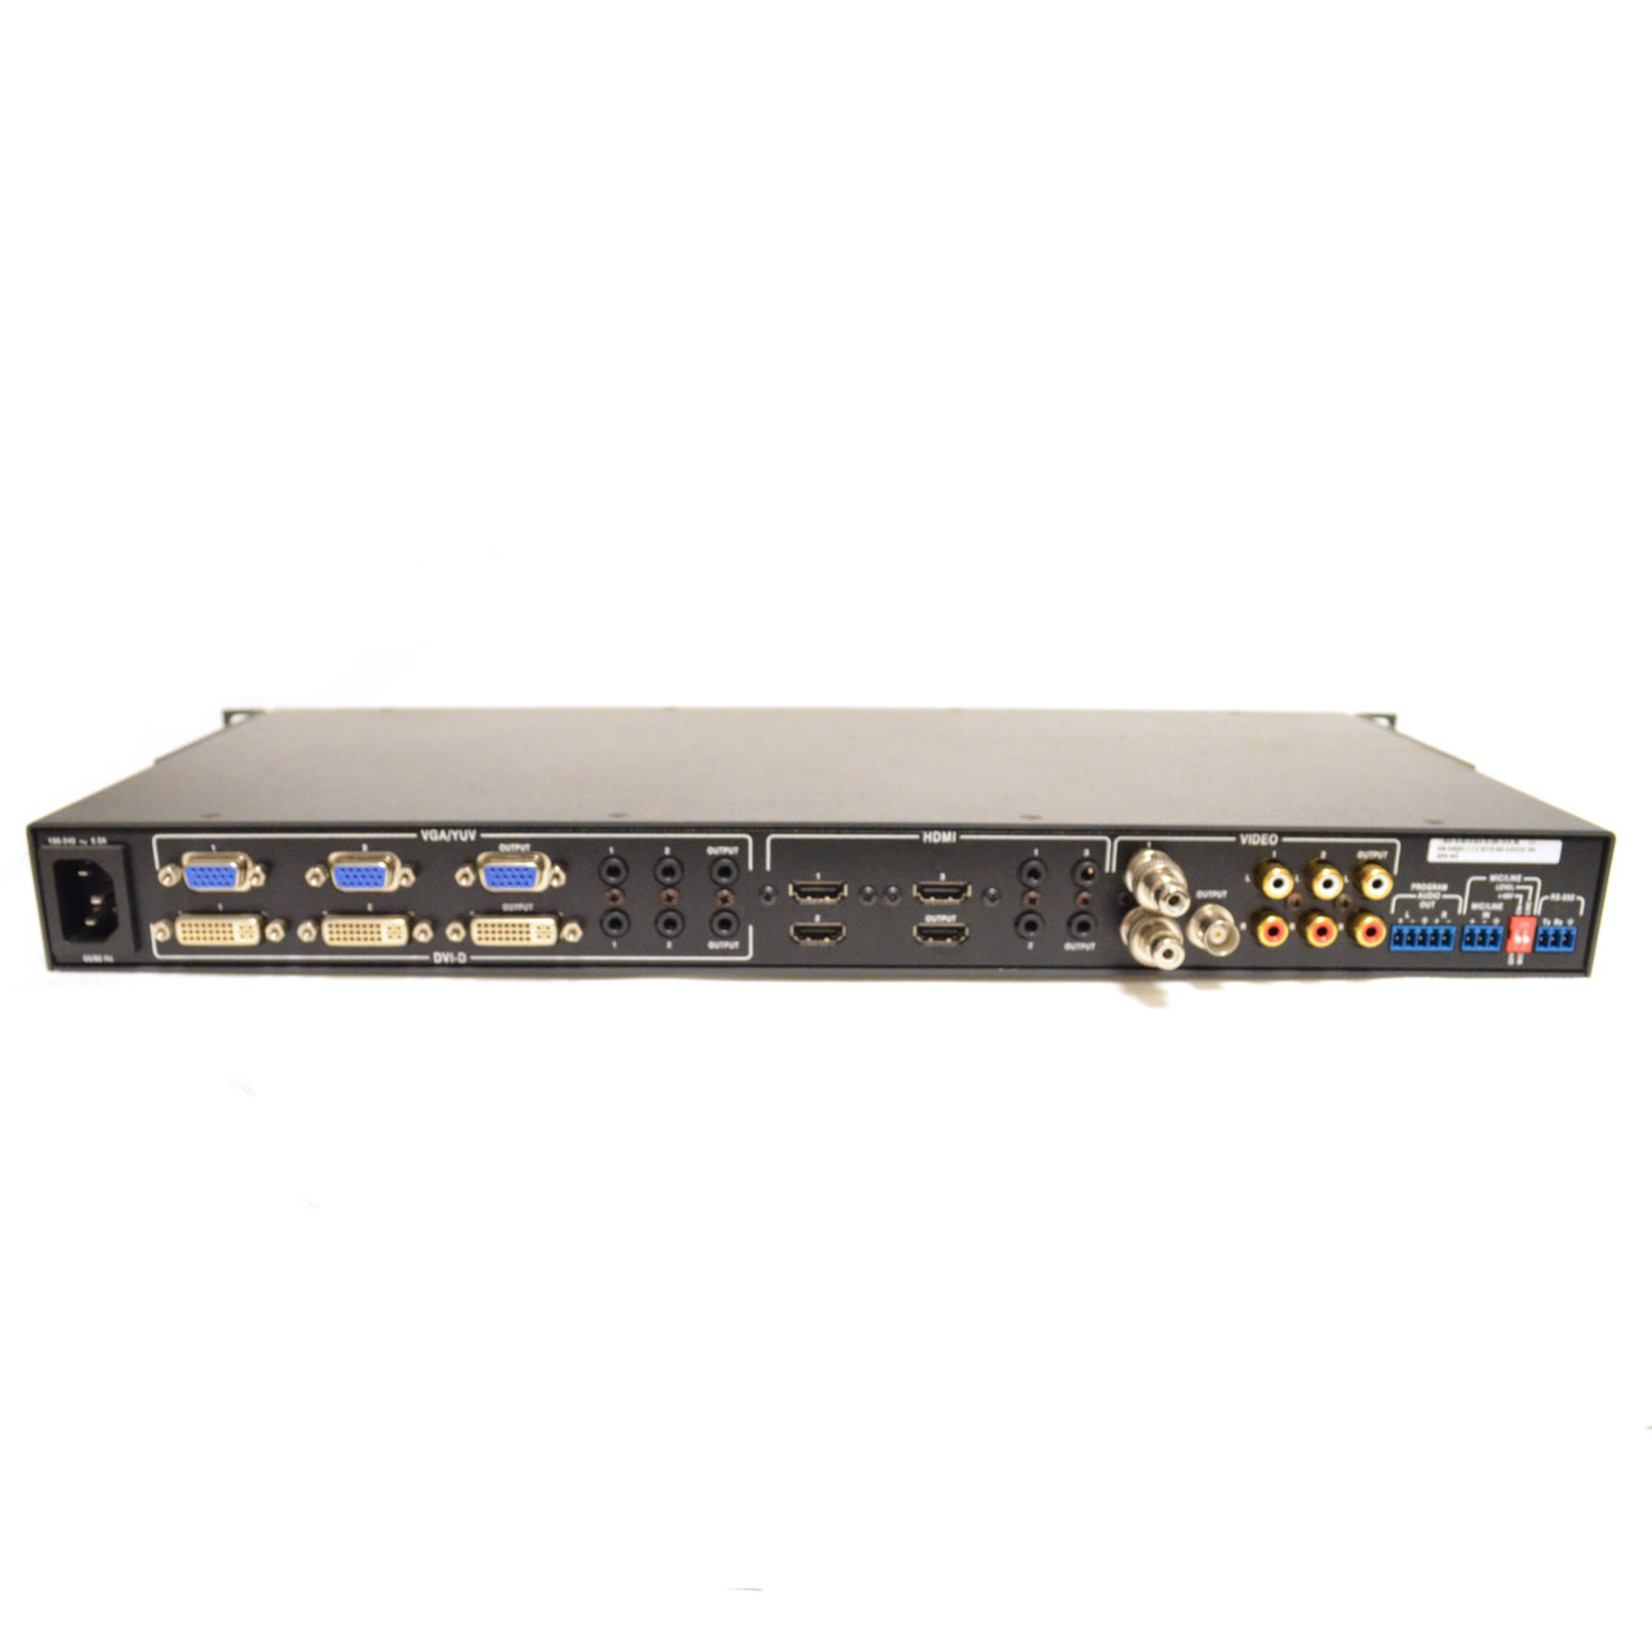 Extron MPS 409 Presentation Switcher